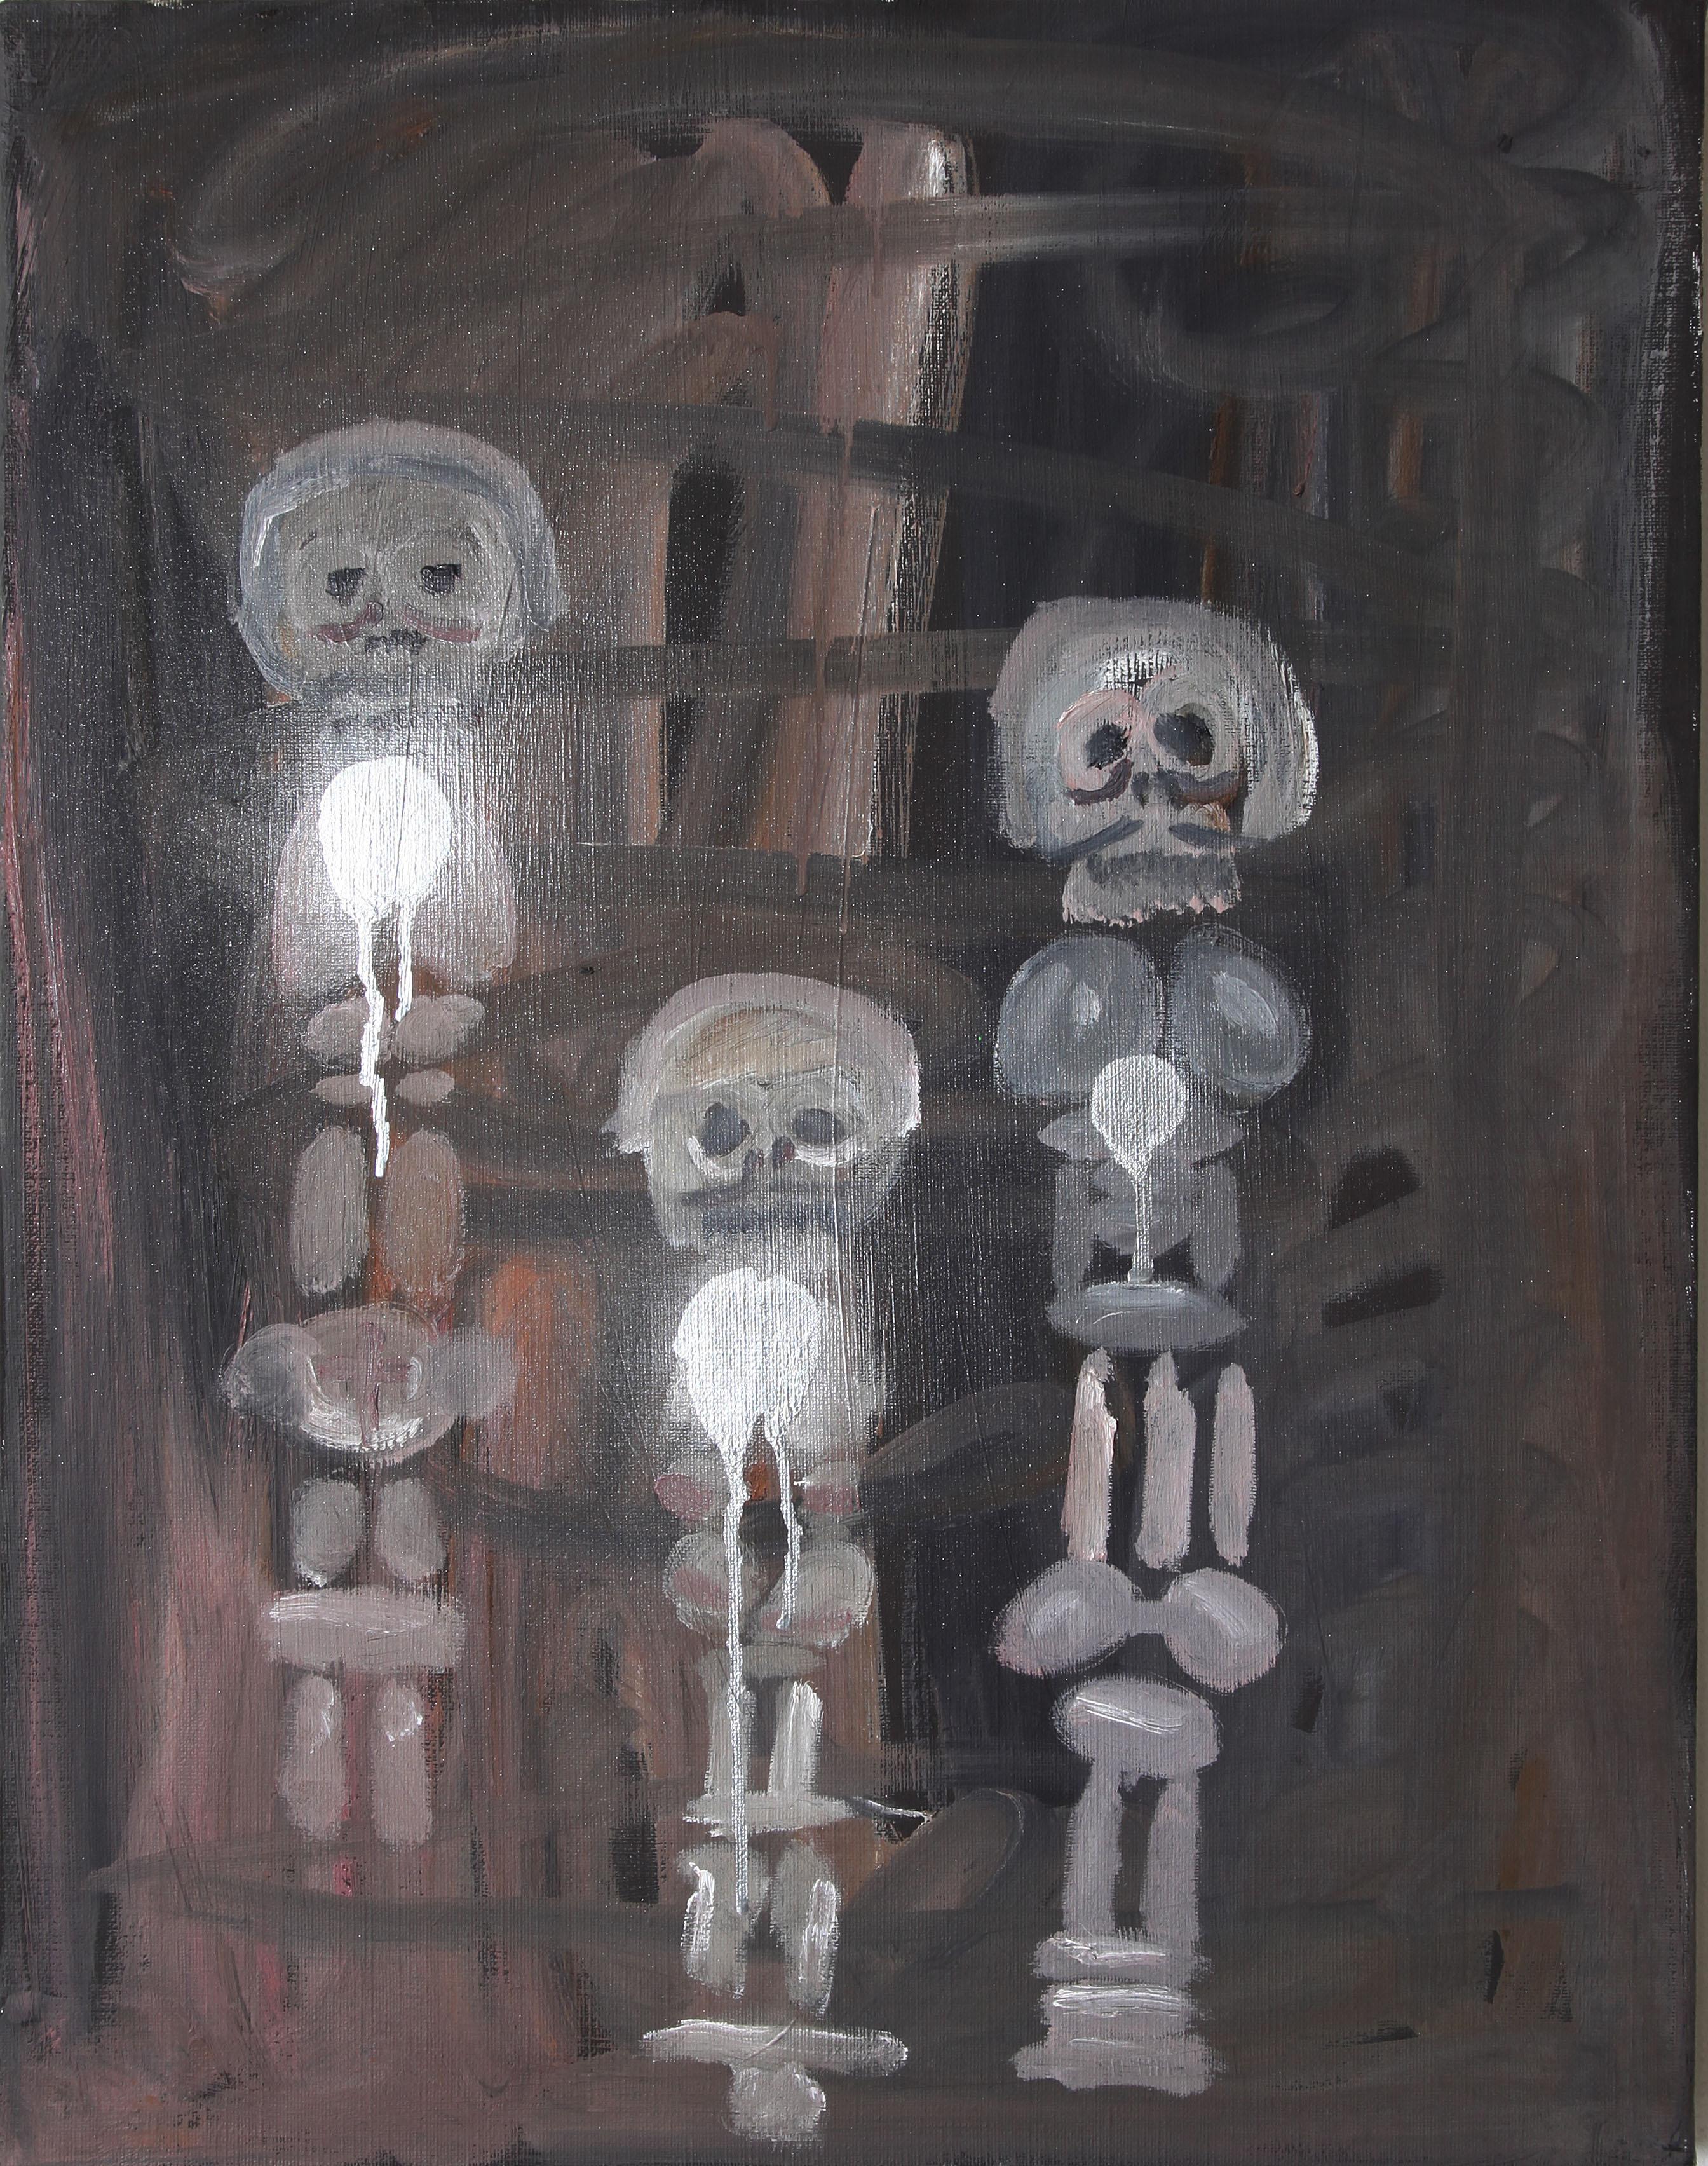 2012 oil on canvas